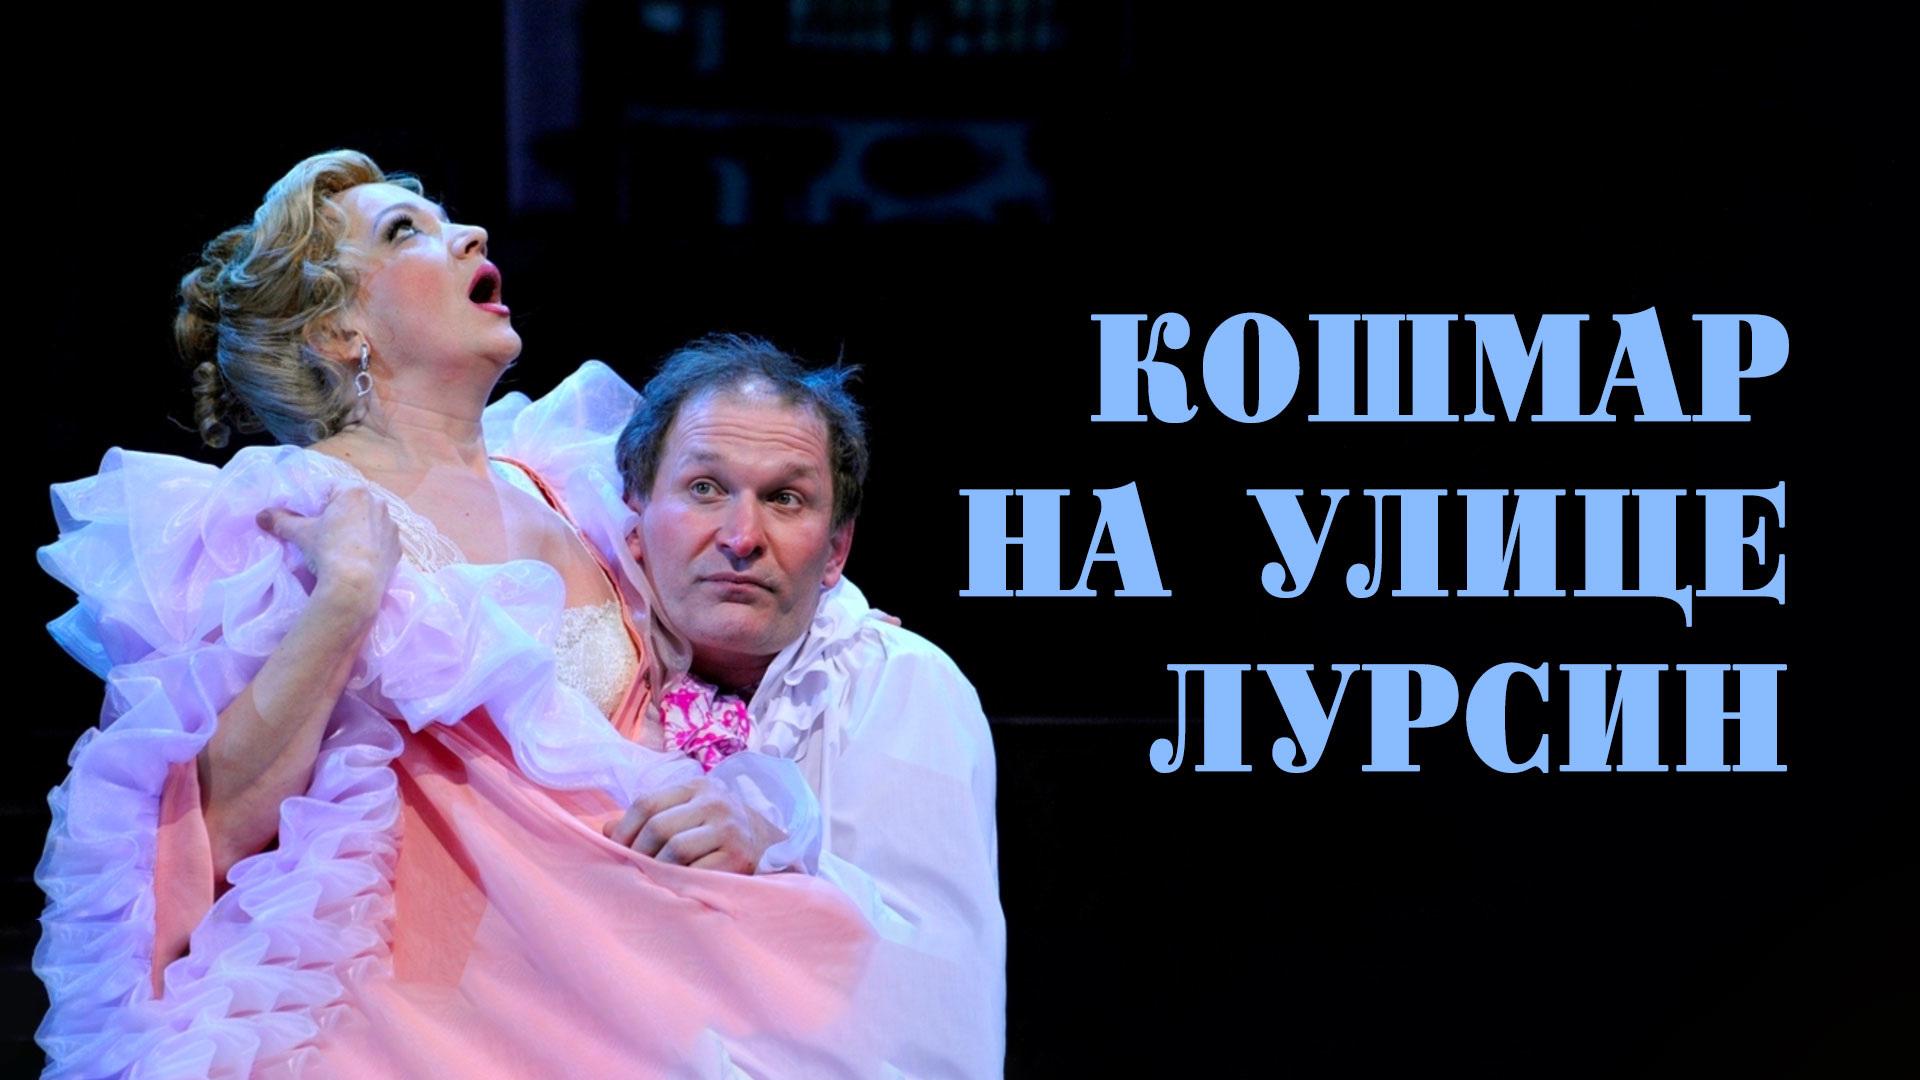 Кошмар на улице Лурсин (Театр Сатиры)